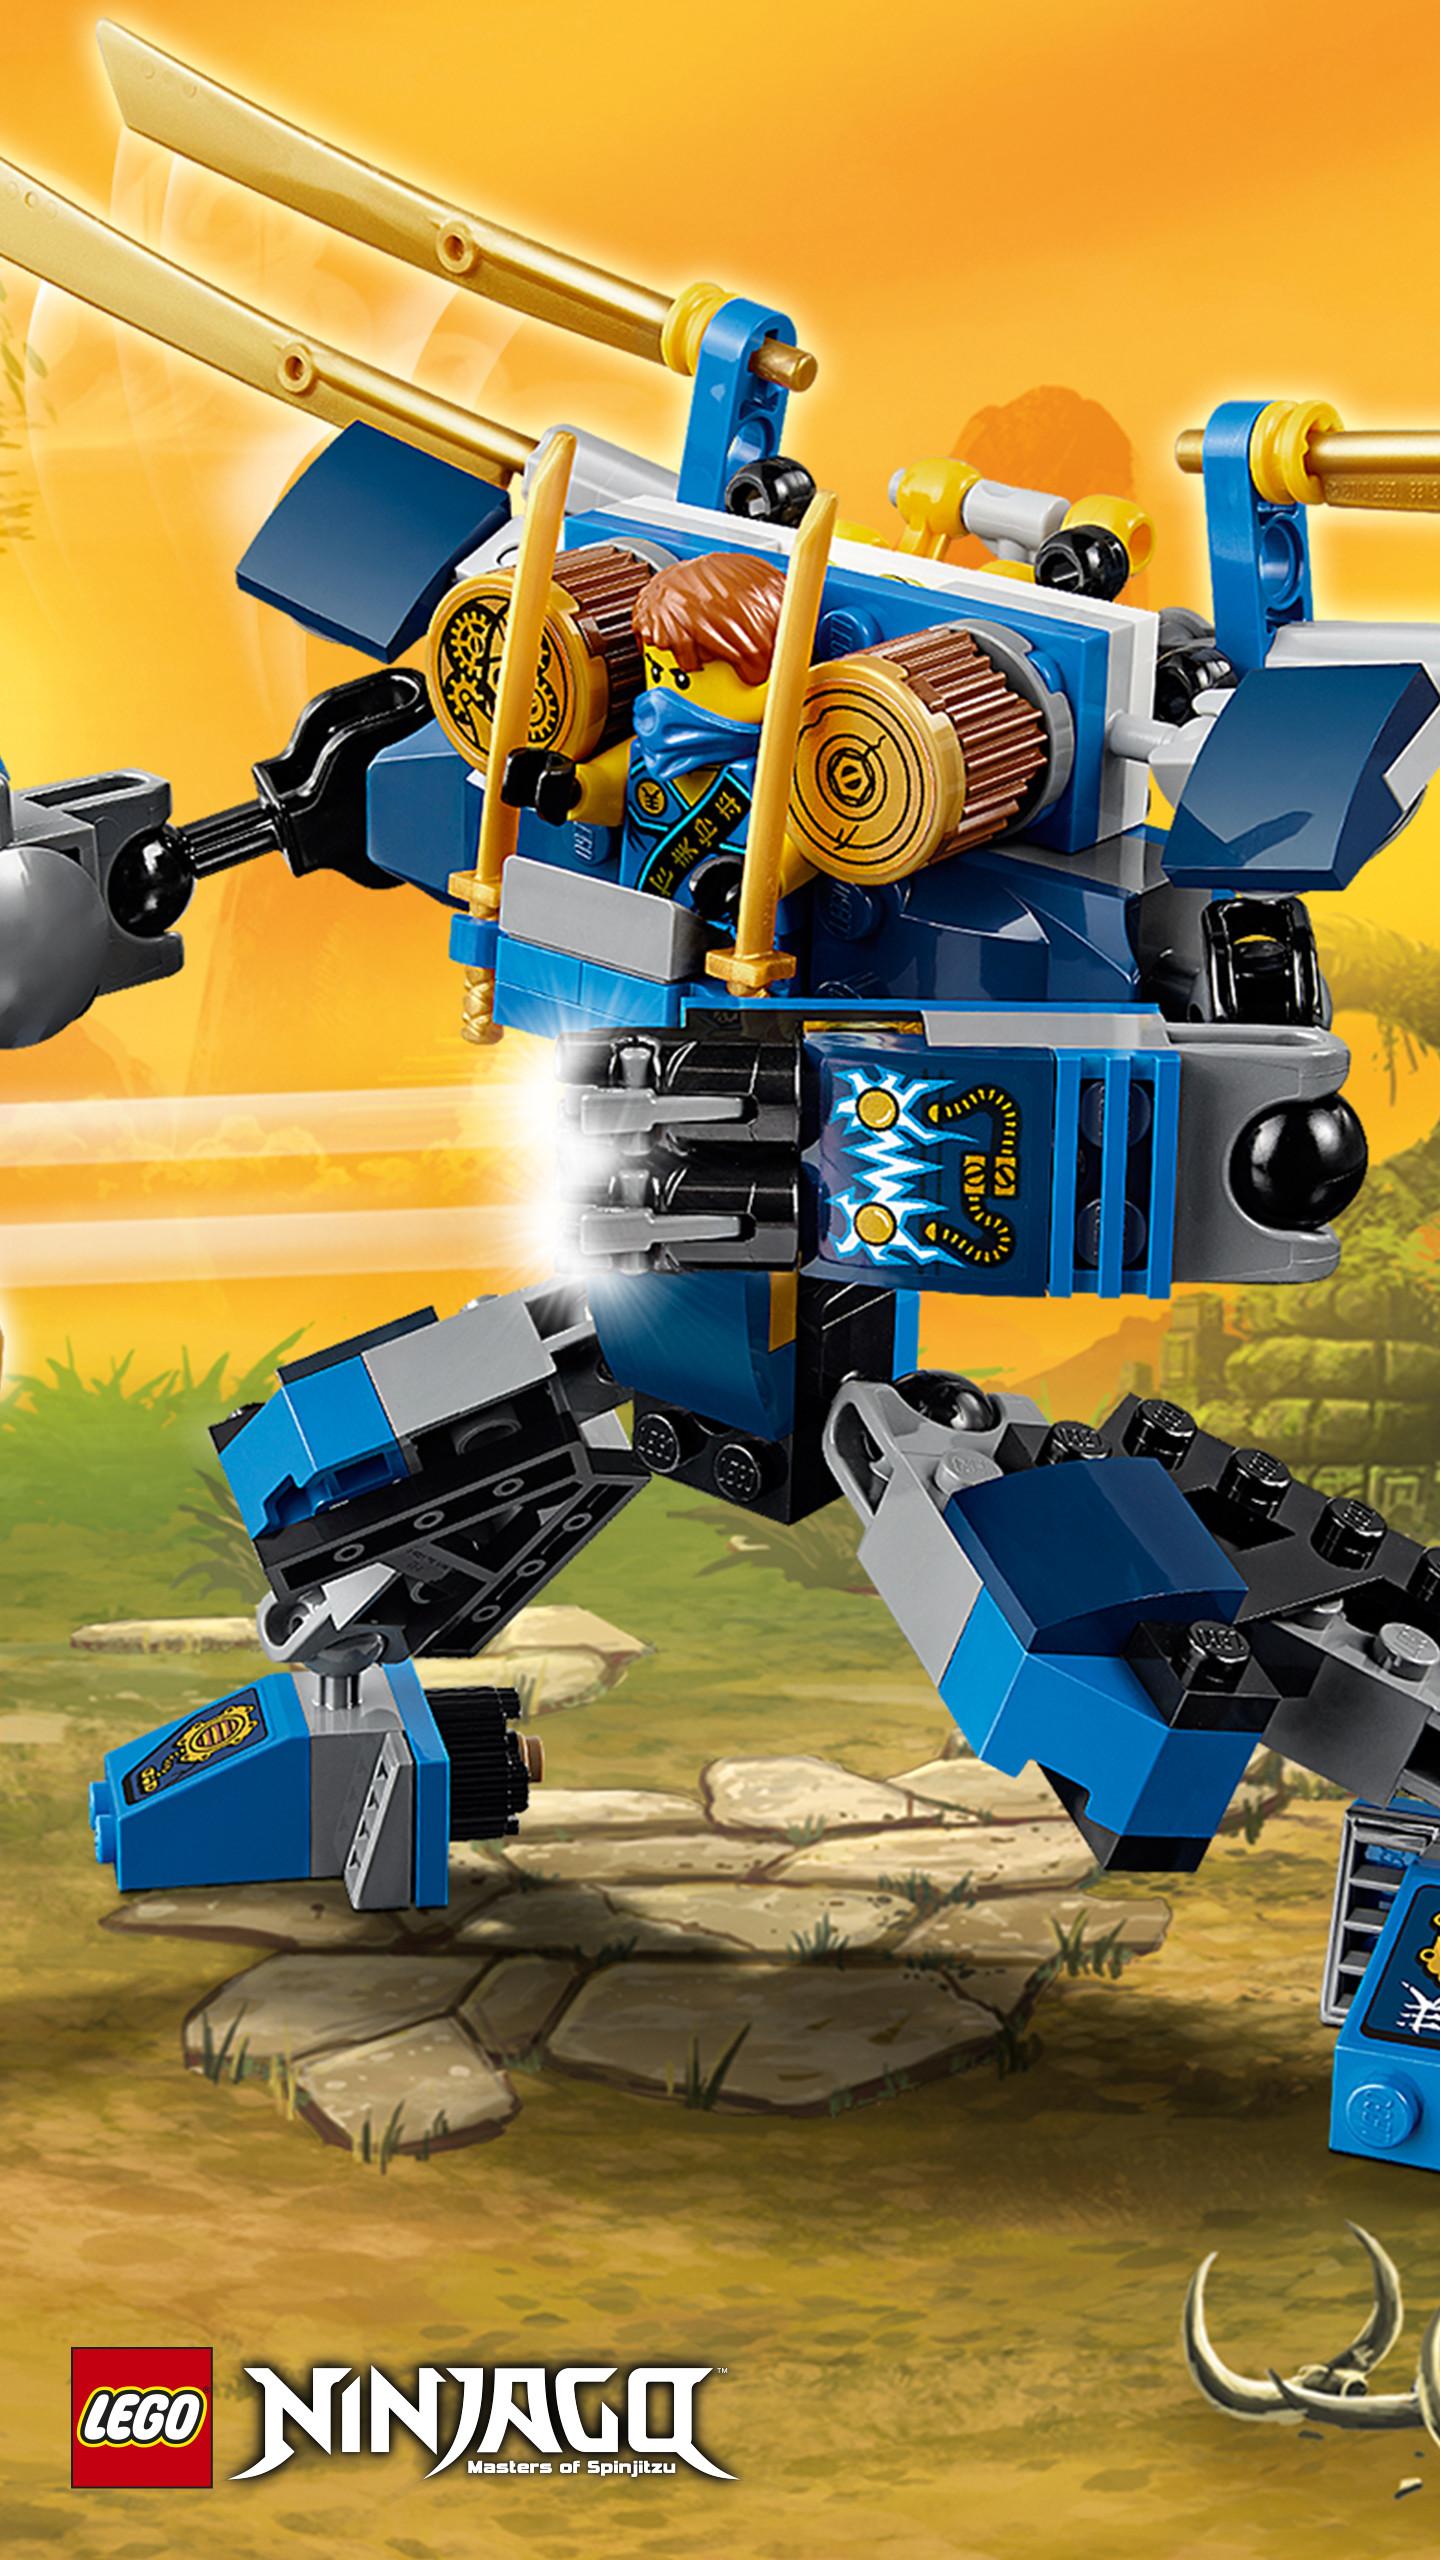 70754 – Wallpaper – Ninjago Activities – LEGO – Ninjago .